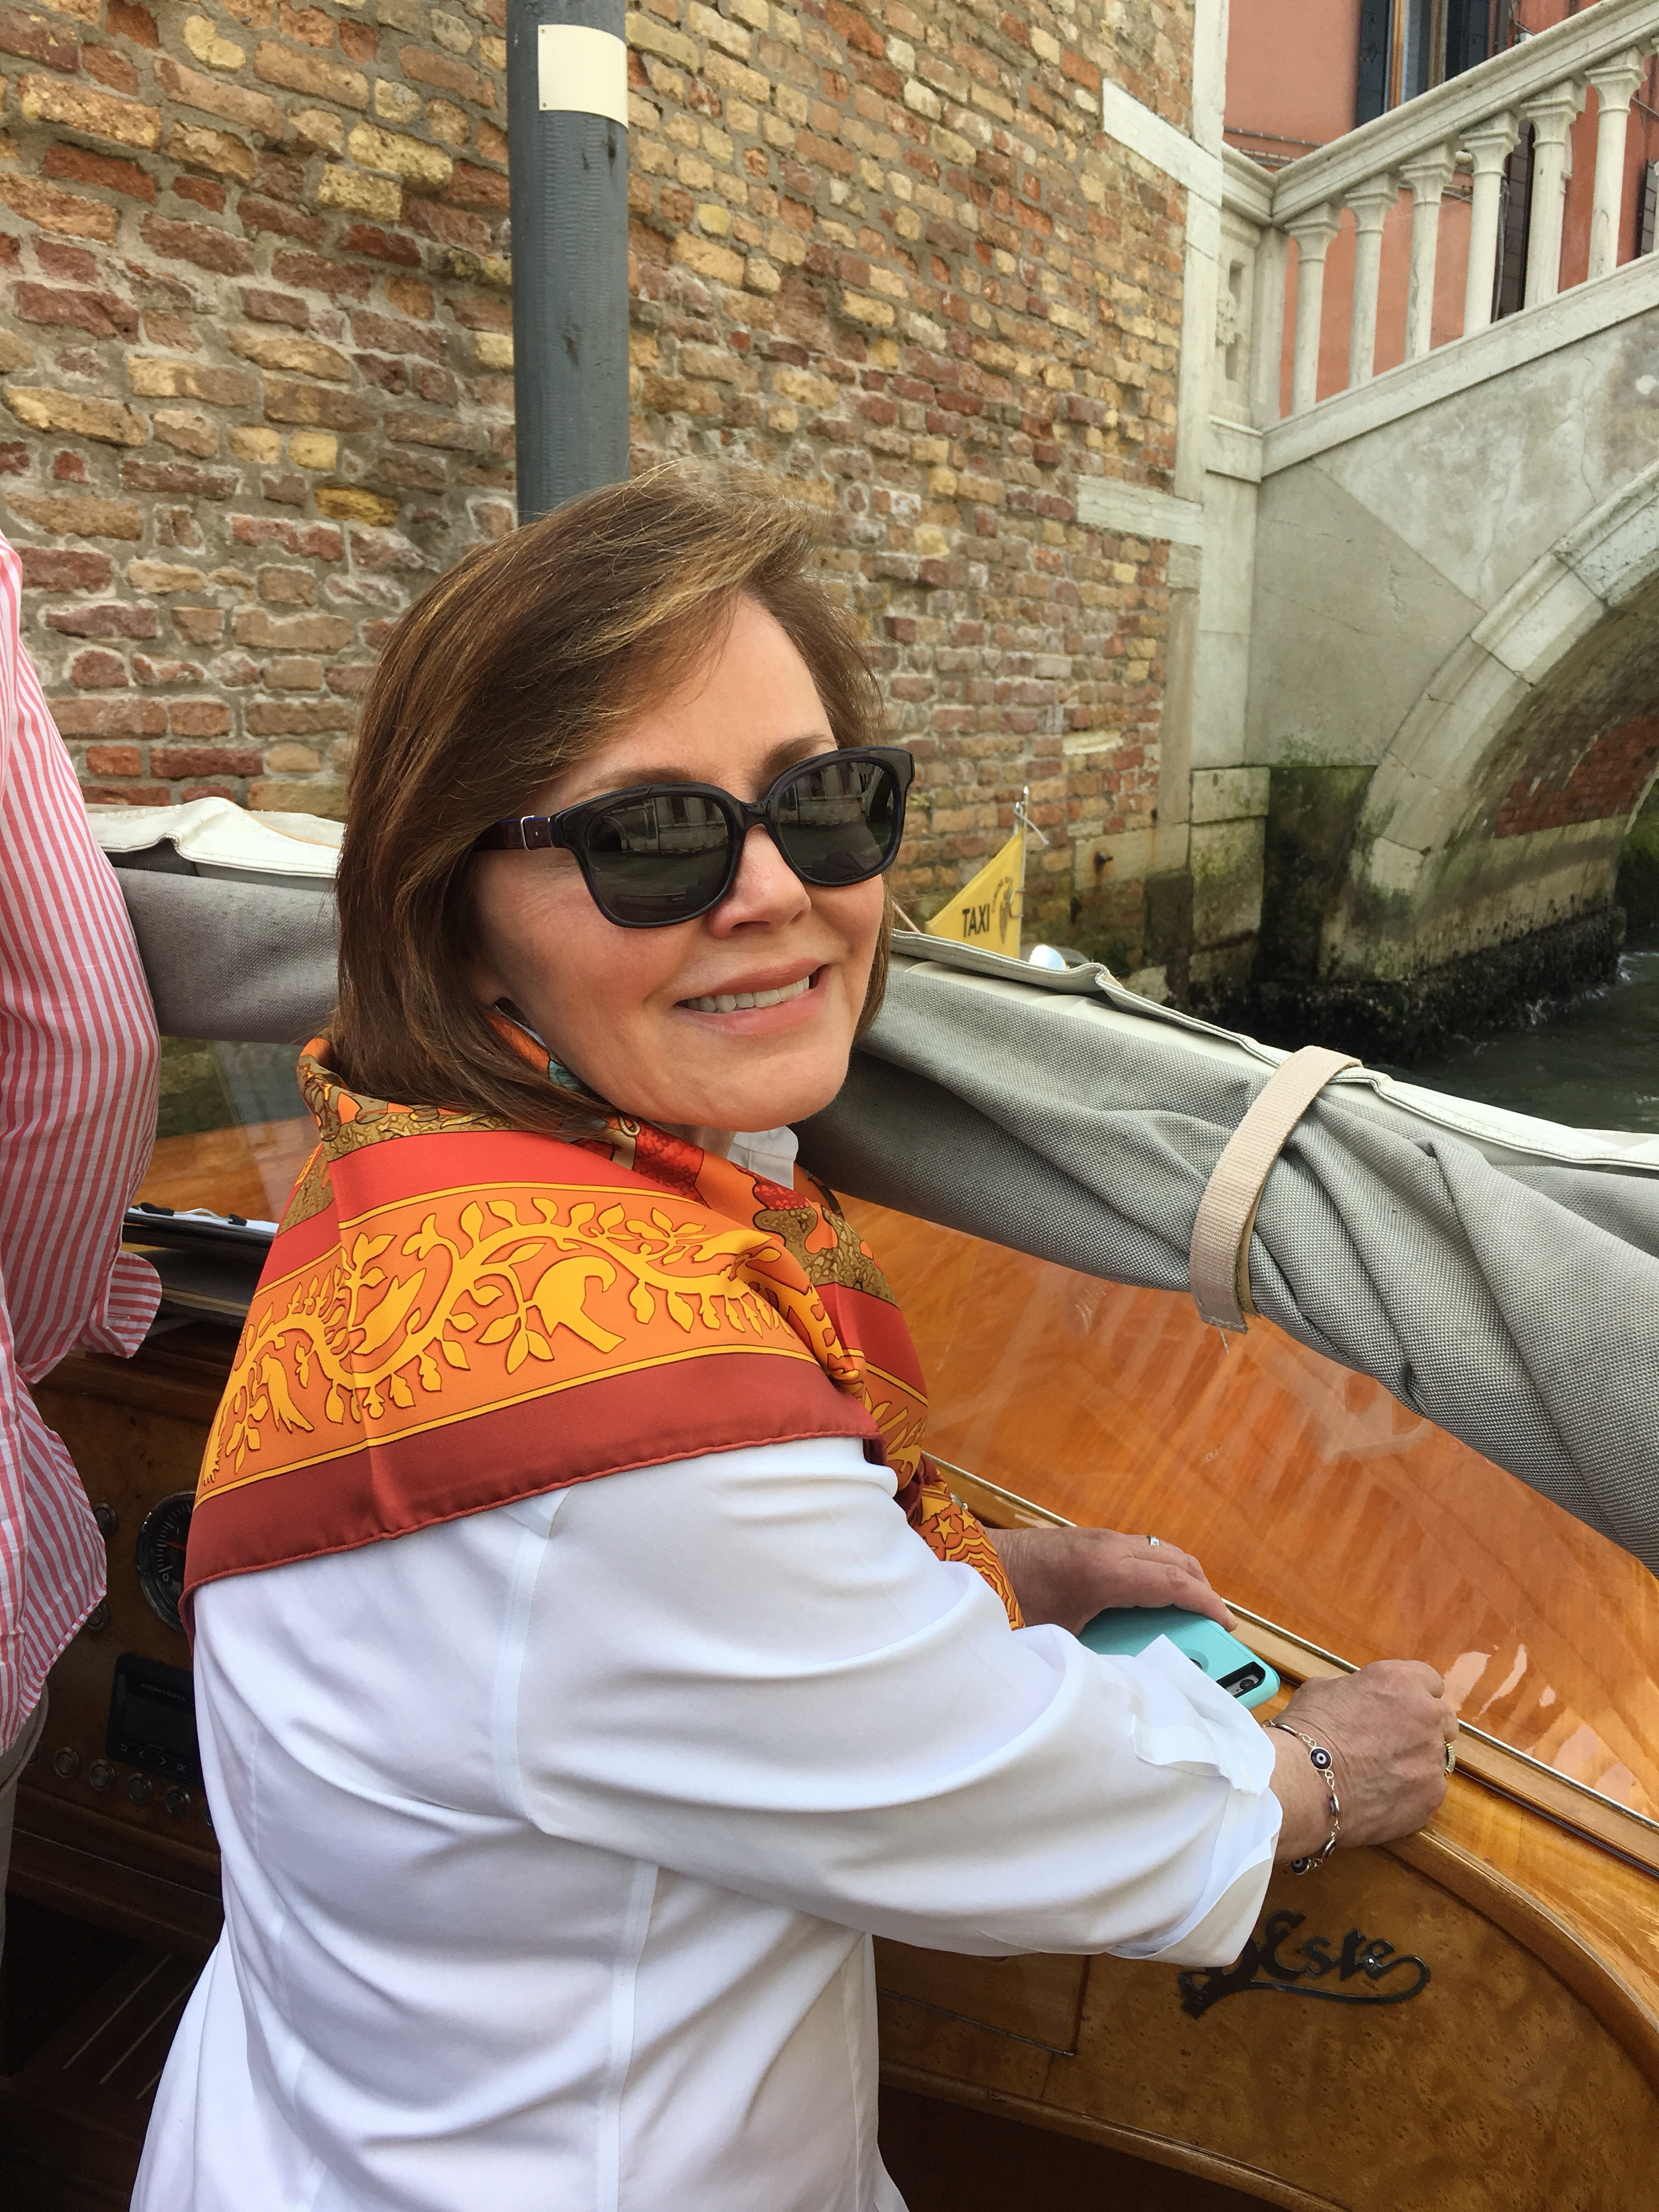 Trudy Dujardin stylish in Hermes, Venice - enjoying www.grand-tourist.com experience